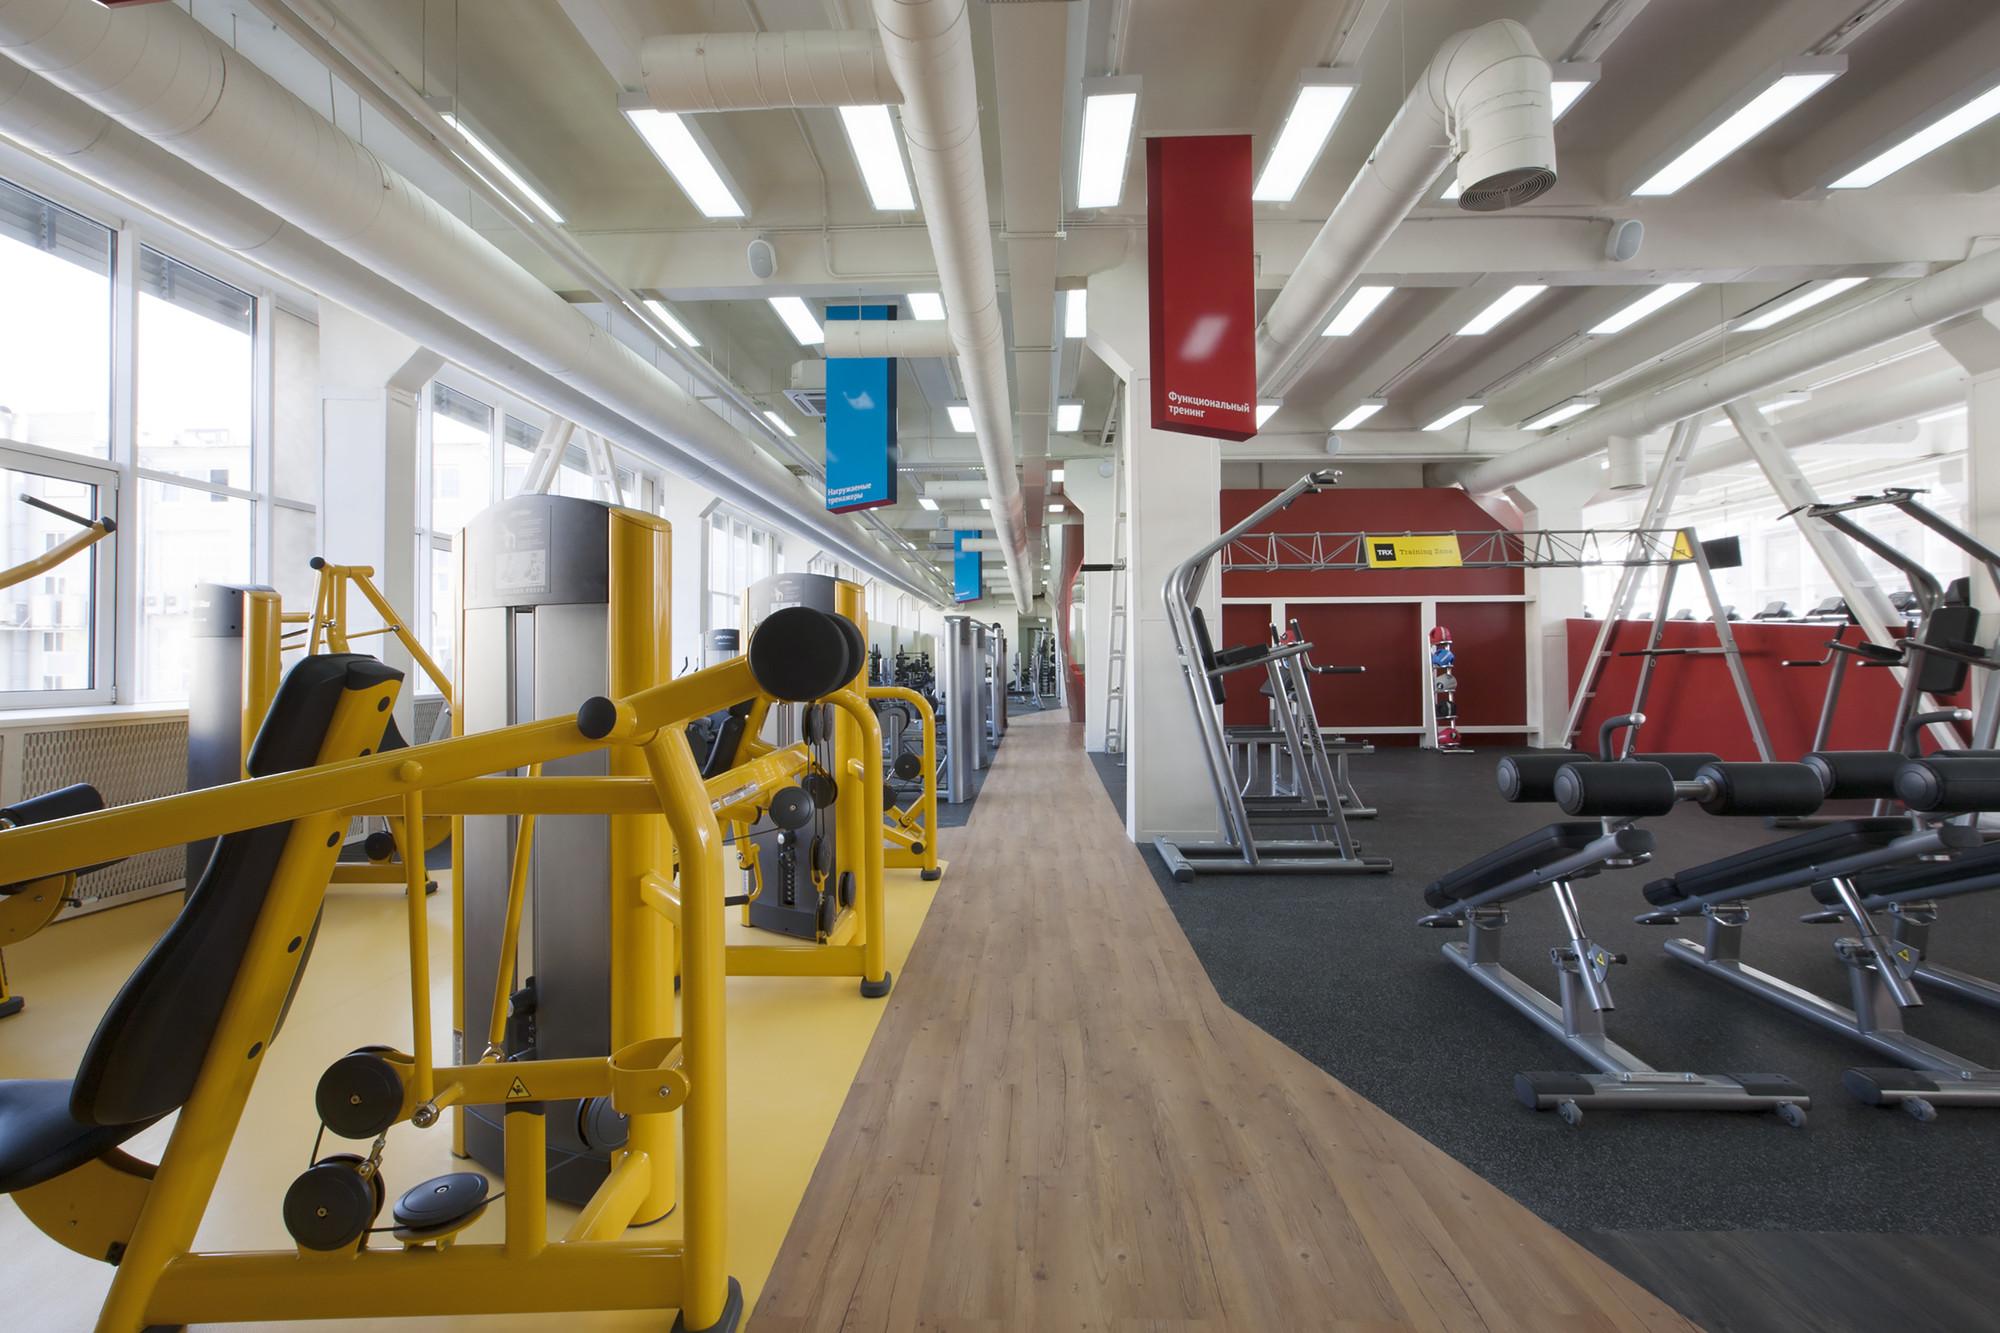 Gallery of Smena Fitness Club / za bor architects - 5